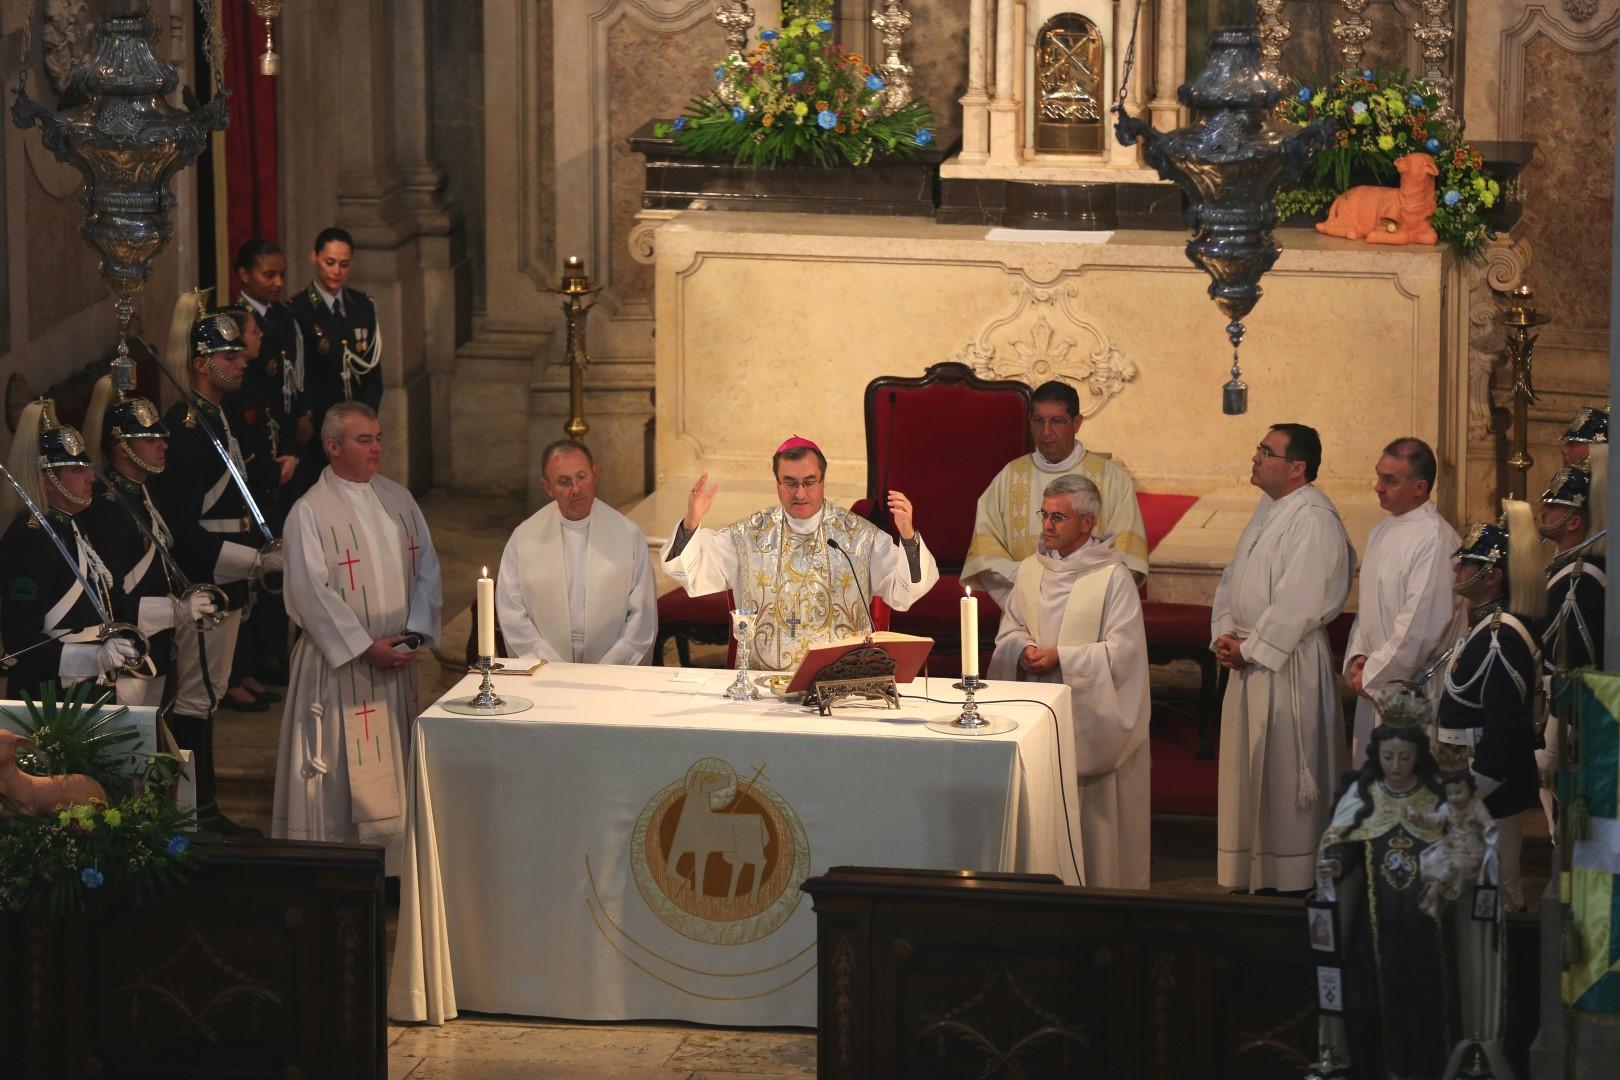 GNR_Missa na Basilica dos Martires_Lisboa_29ABR15_2